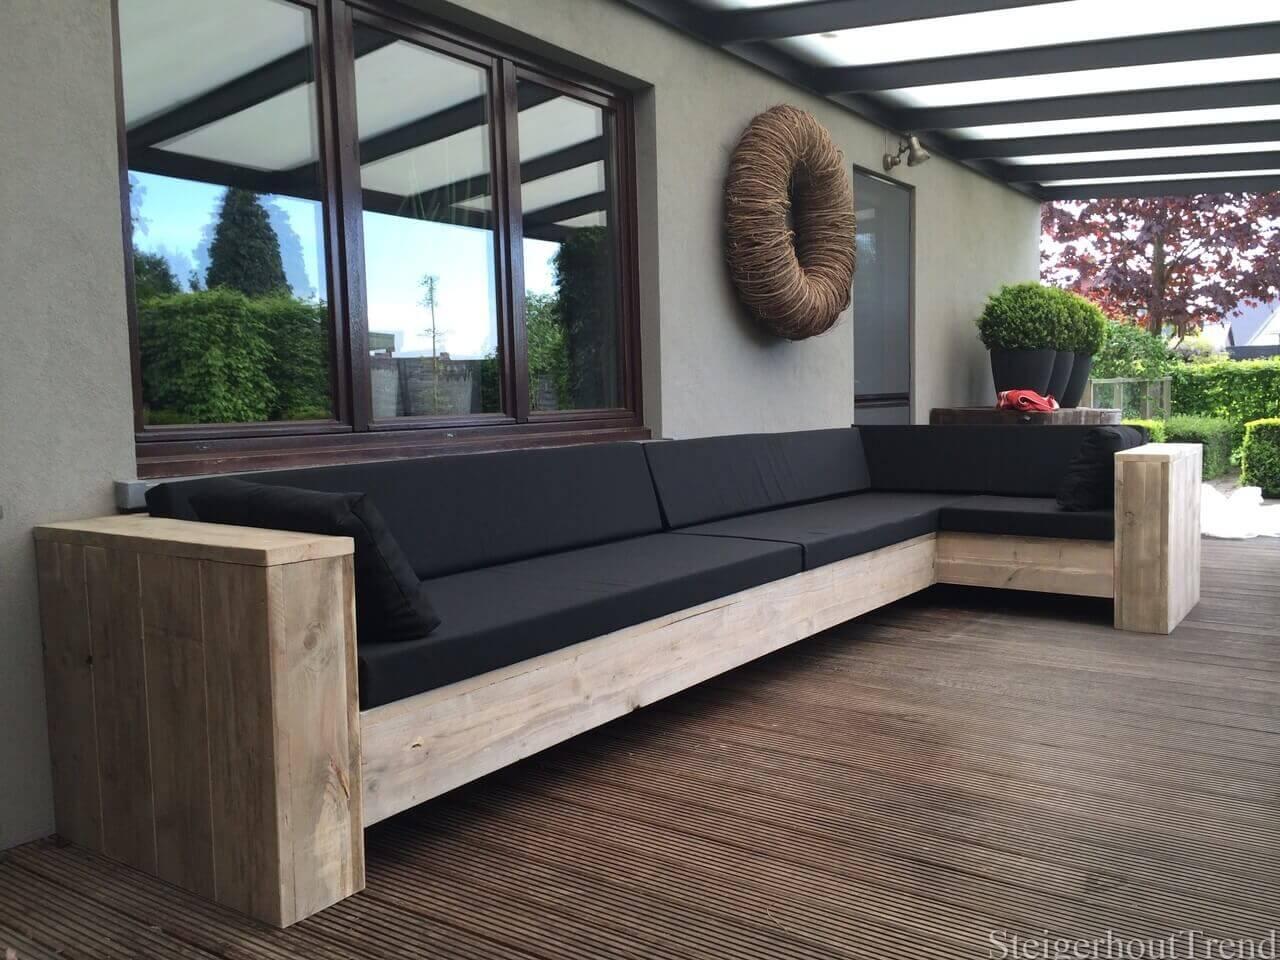 Steigerhouten loungebank tucson steigerhouttrend for Steigerhout loungeset zelf maken